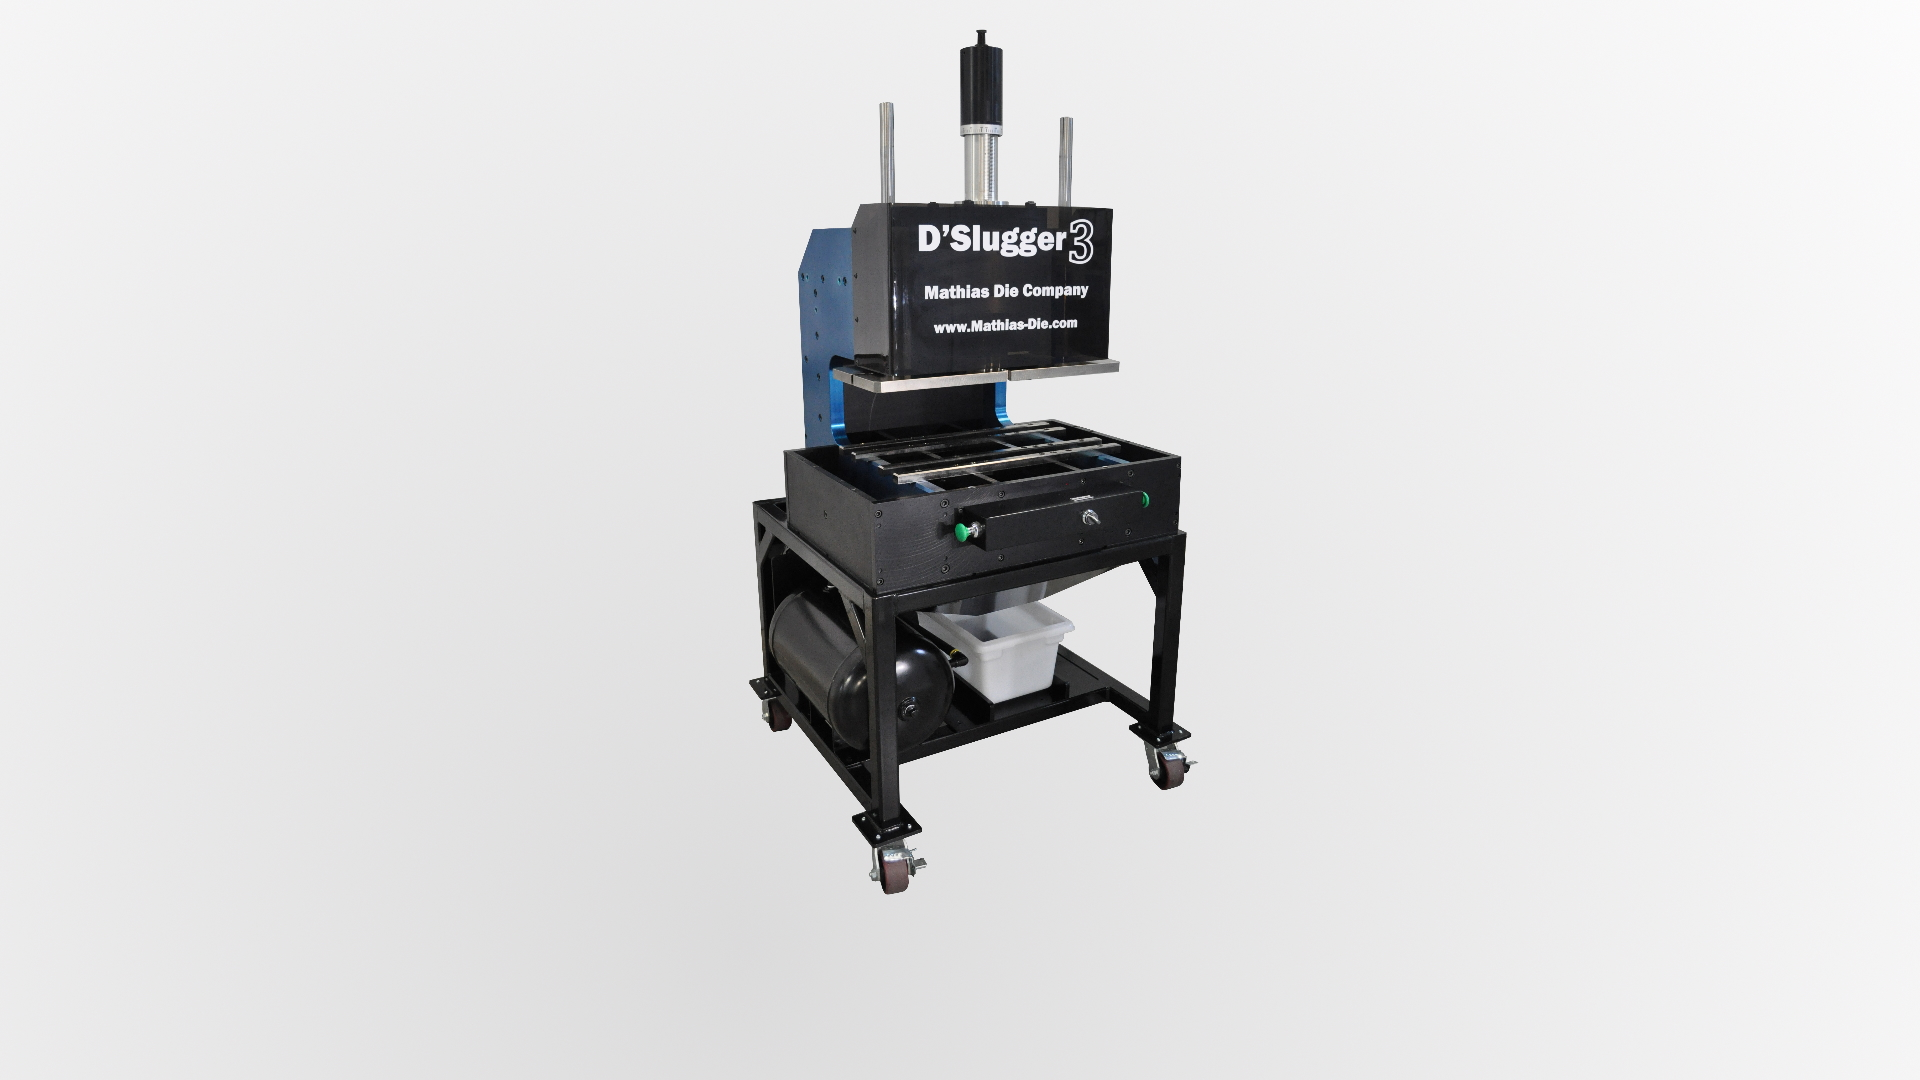 D'Slugger 3 Machine